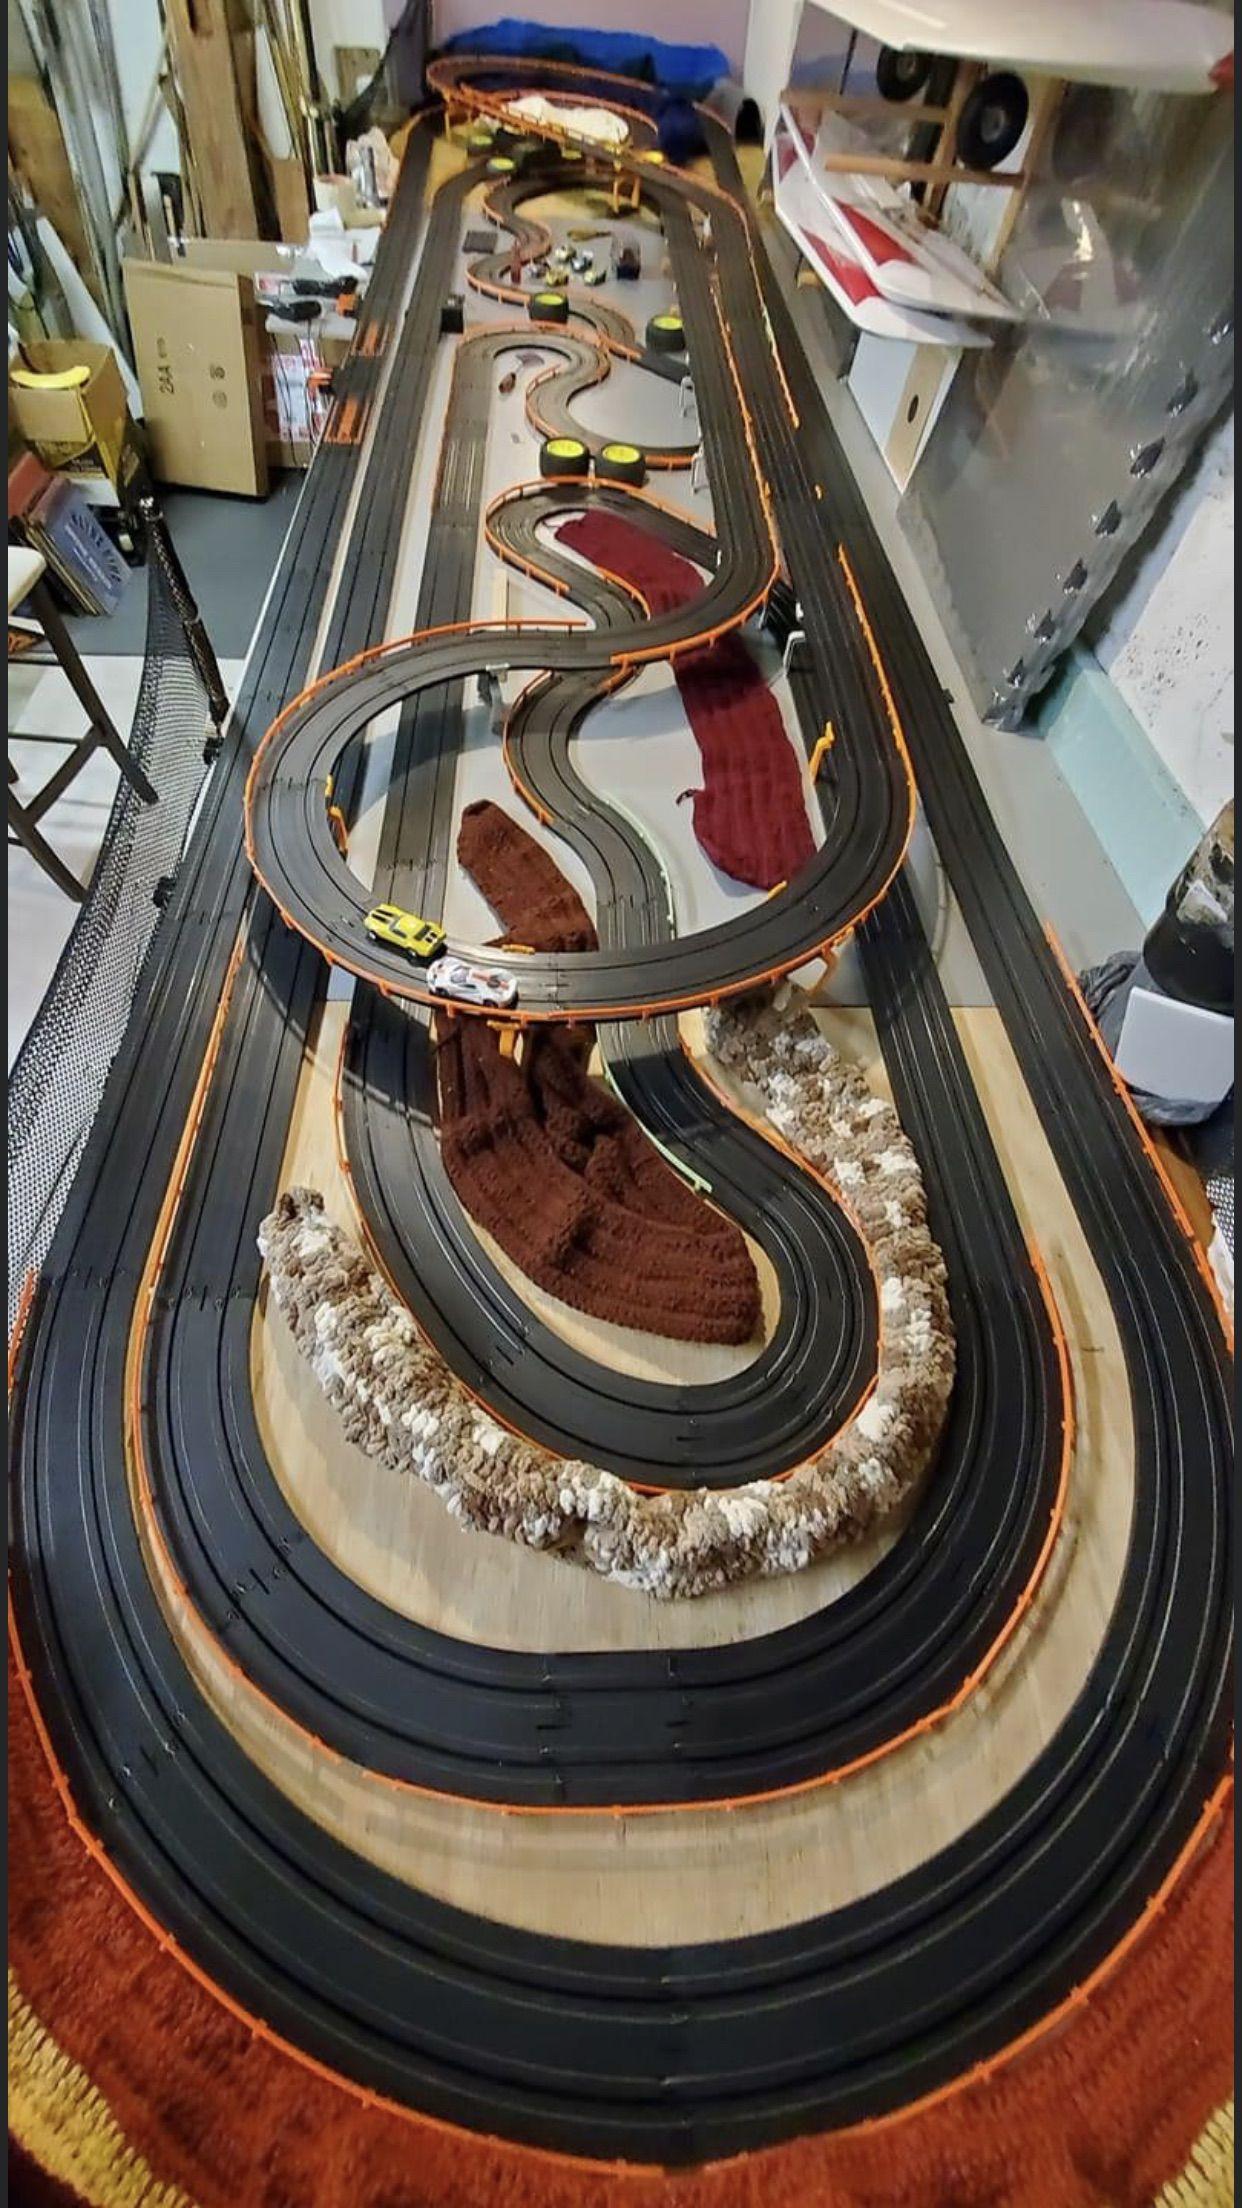 1 64 Ho Slot Car Tracks In 2020 Slot Cars Slot Car Race Track Slot Car Tracks